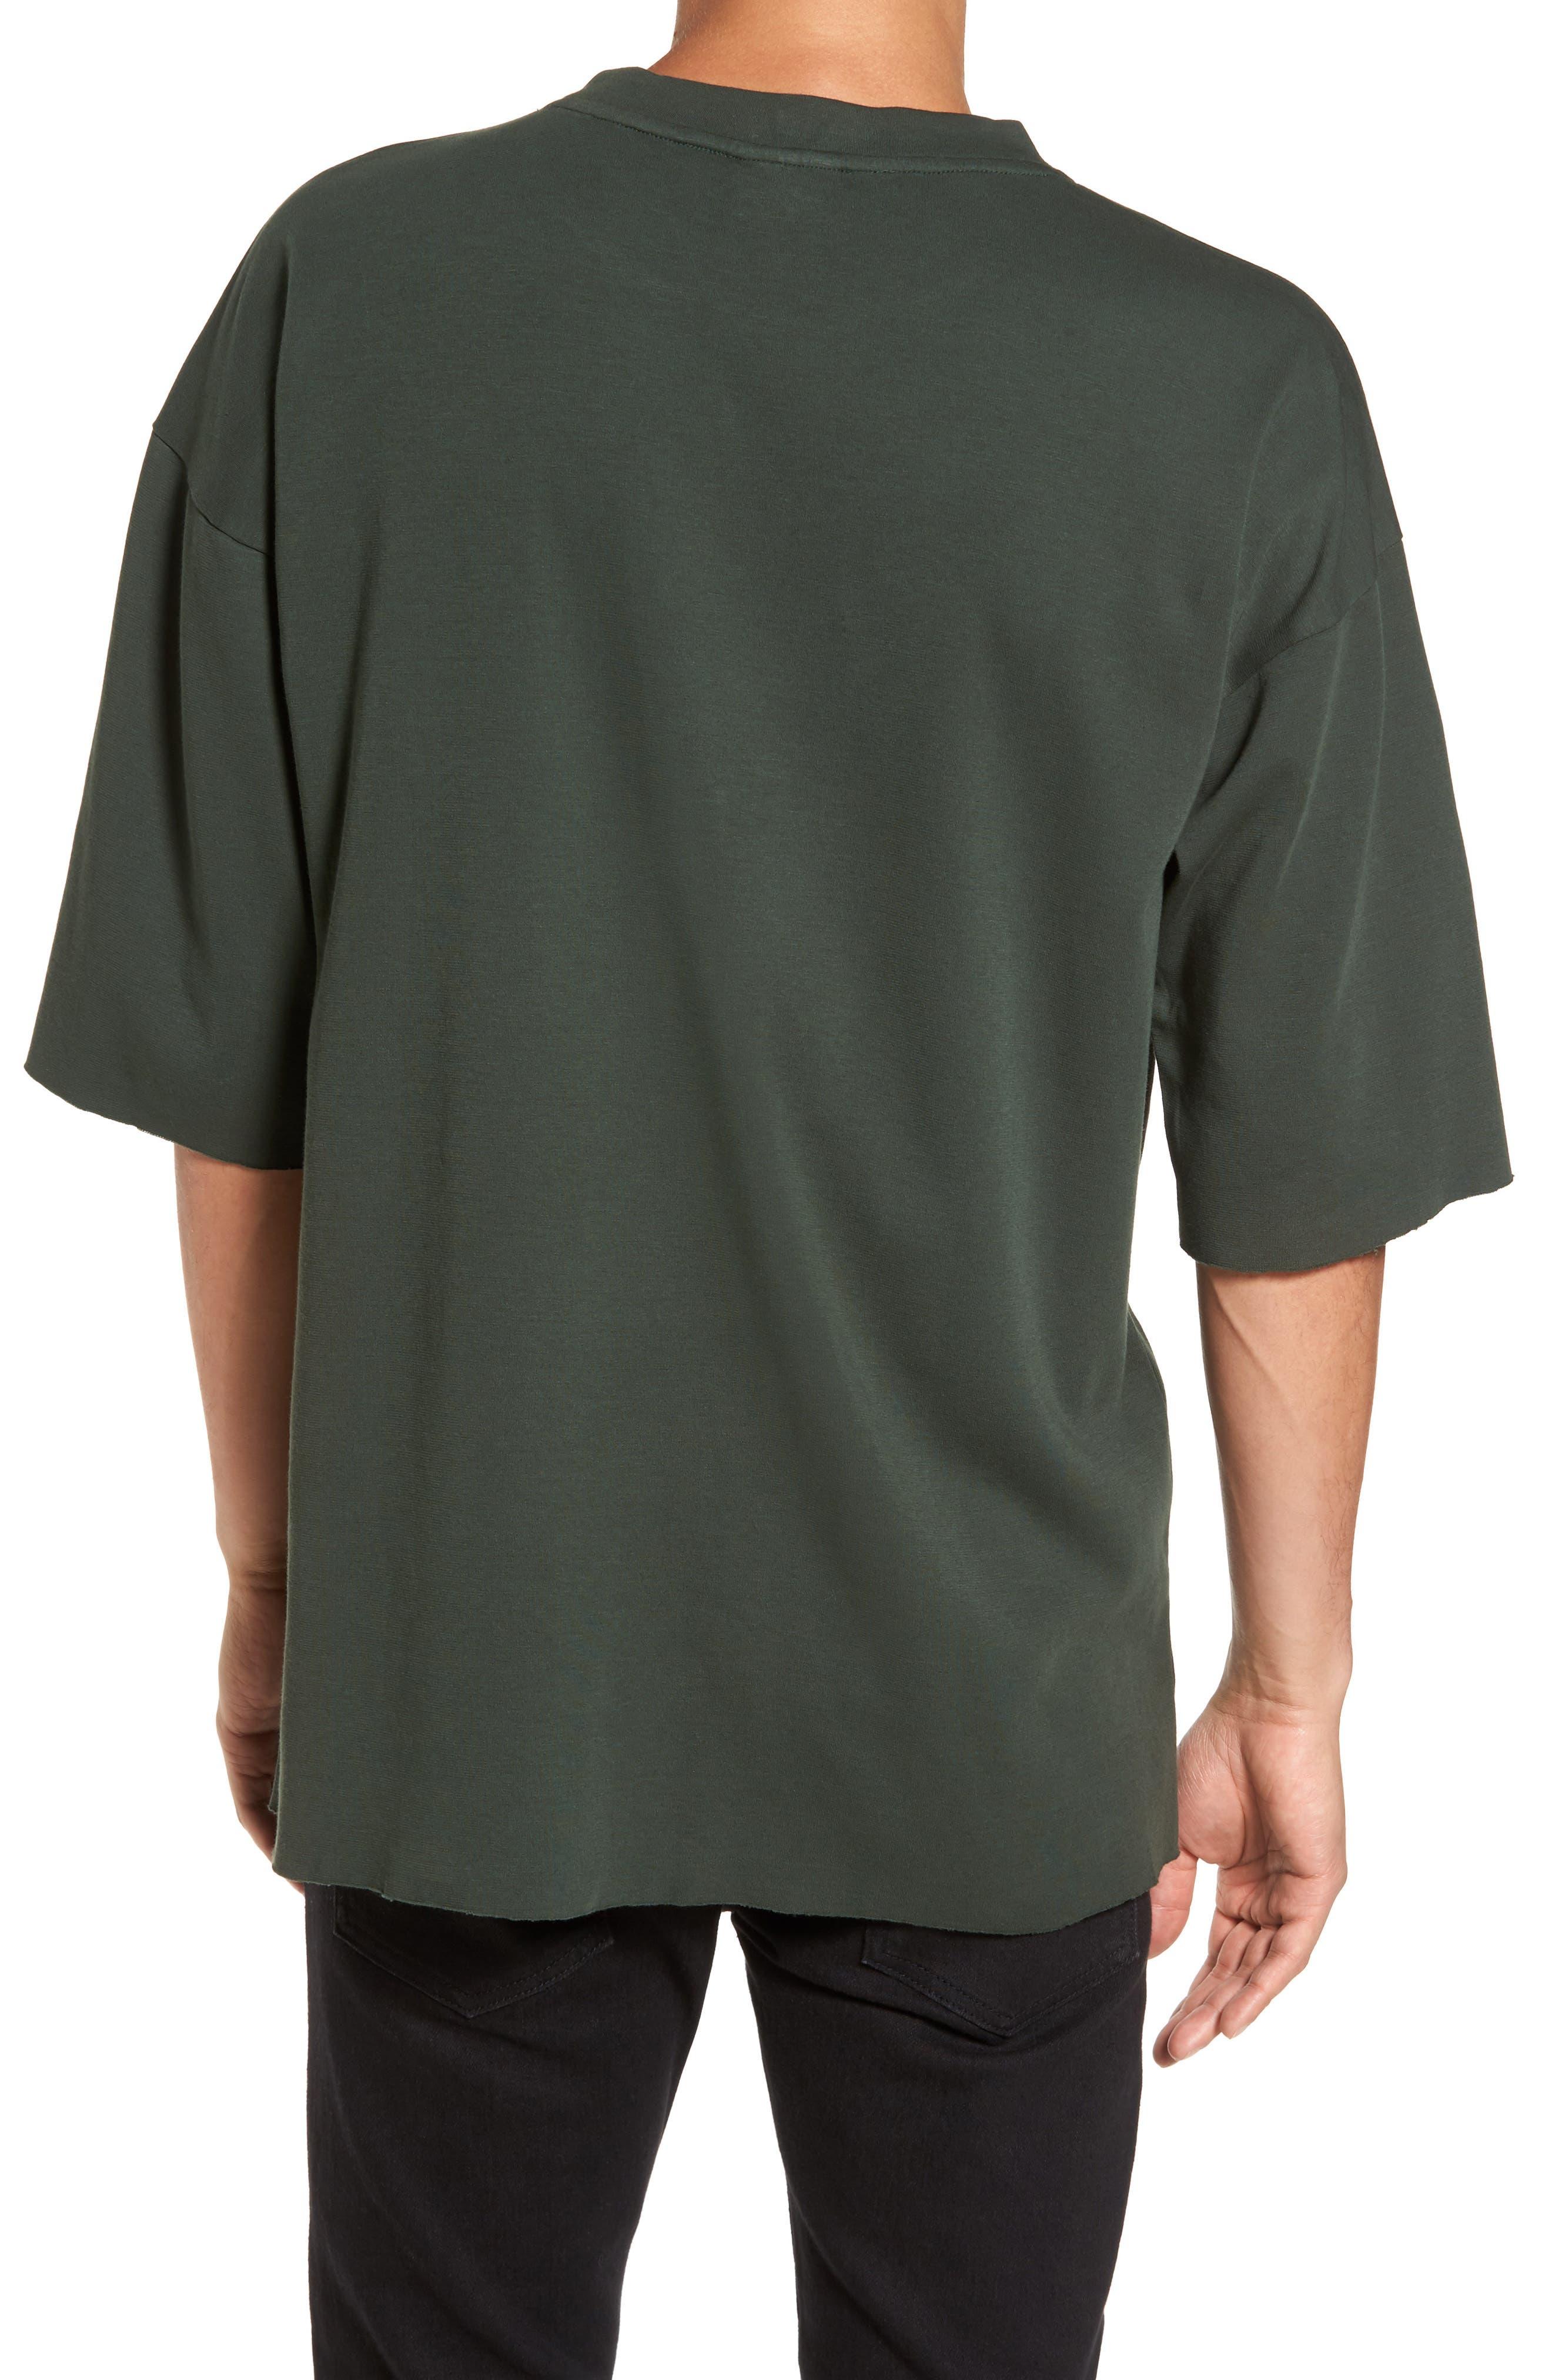 Mauno Pocket T-Shirt,                             Alternate thumbnail 2, color,                             300